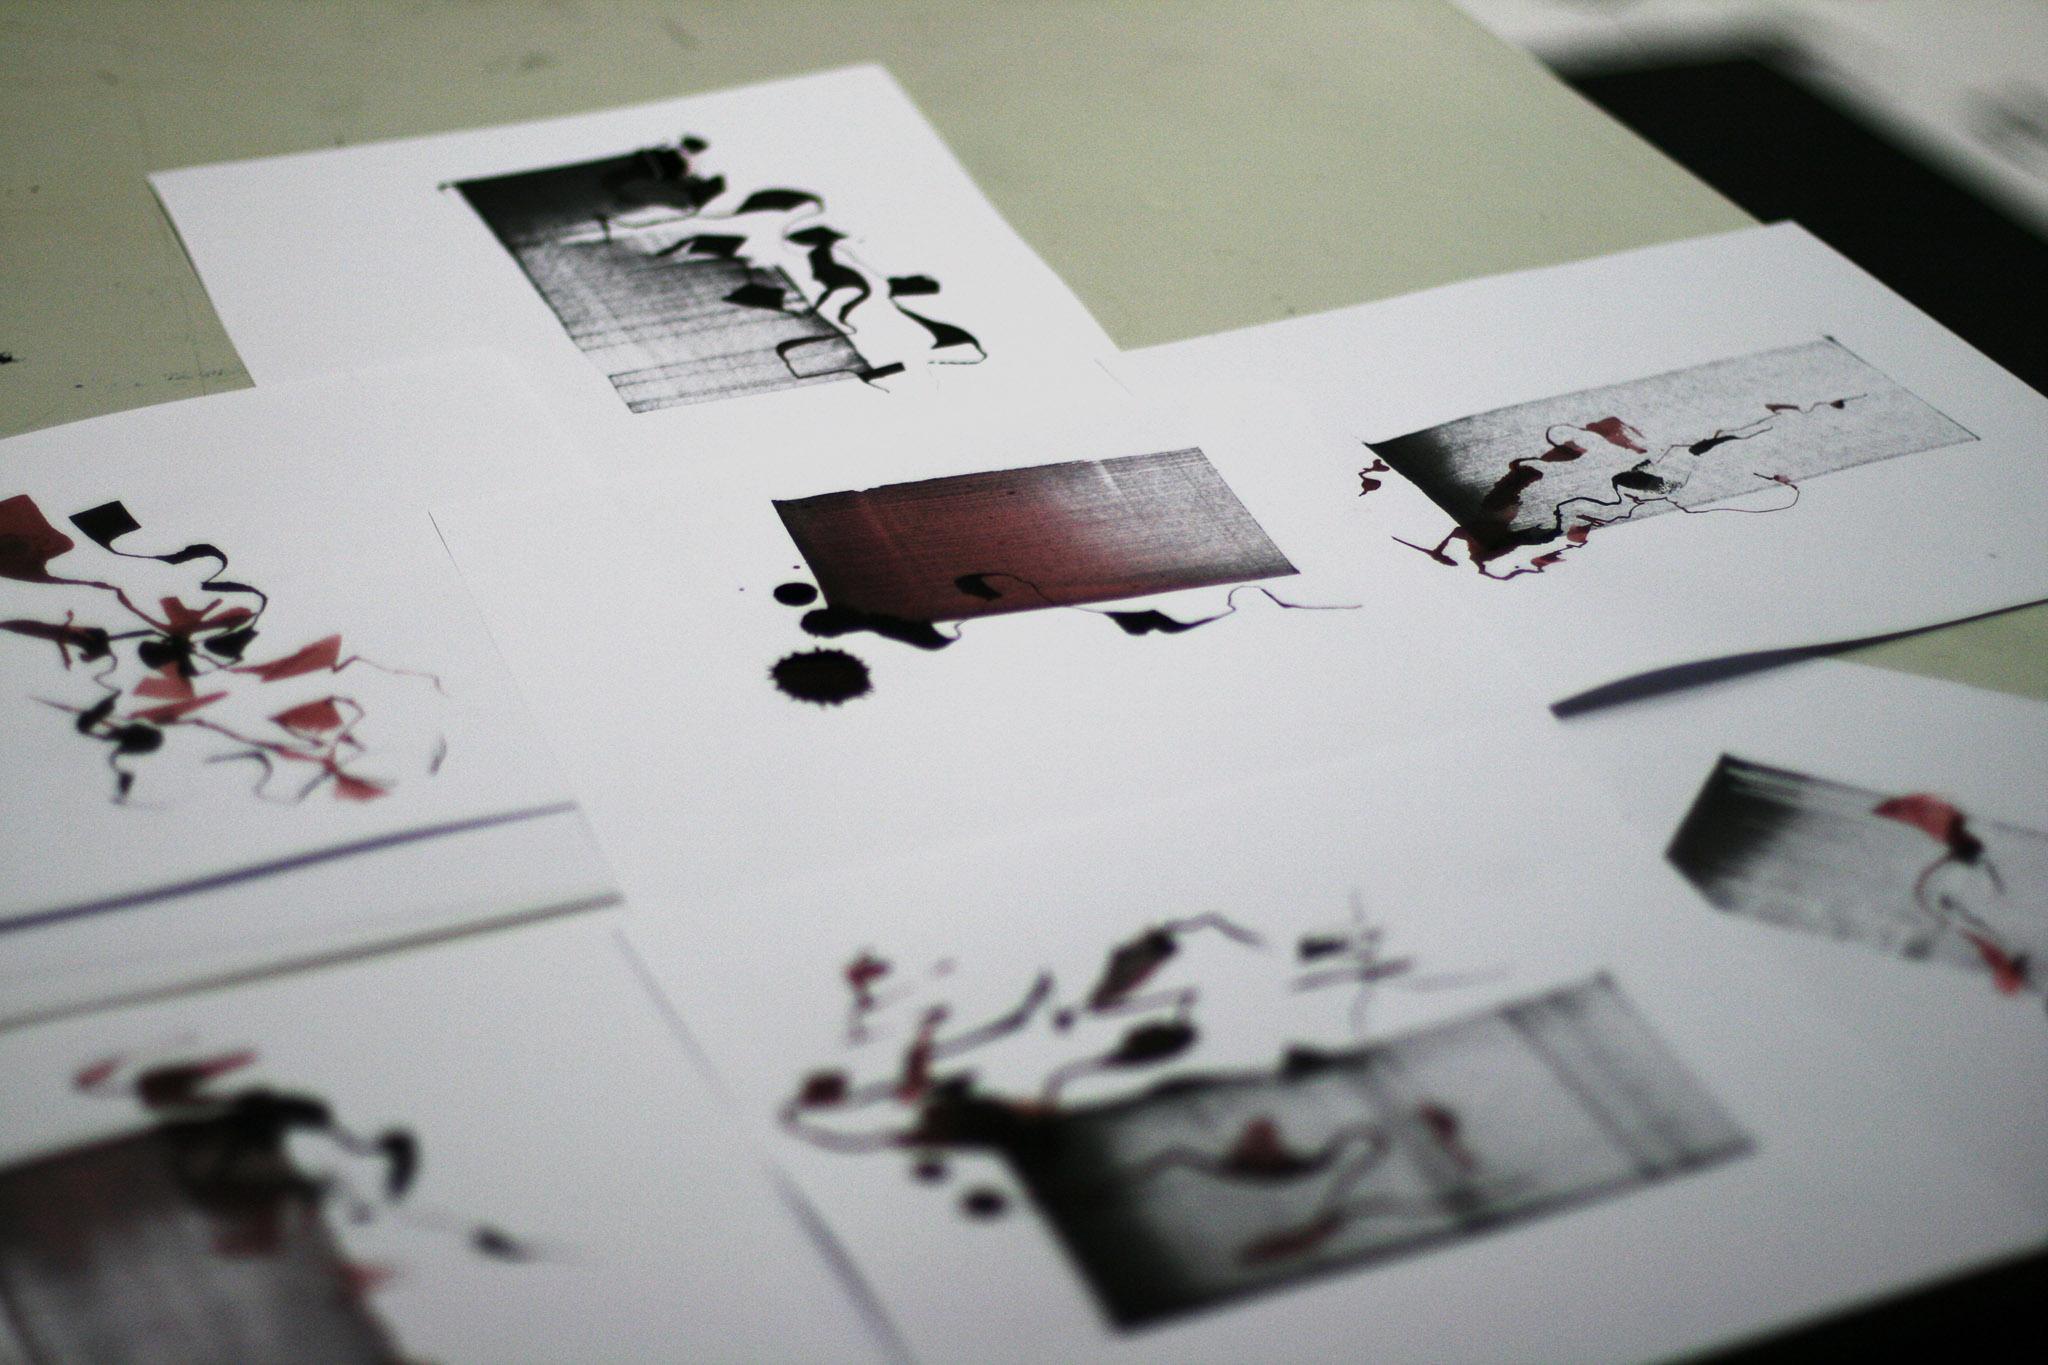 hannah-rauss-workshop-freie-kalligraphie-noe-io09